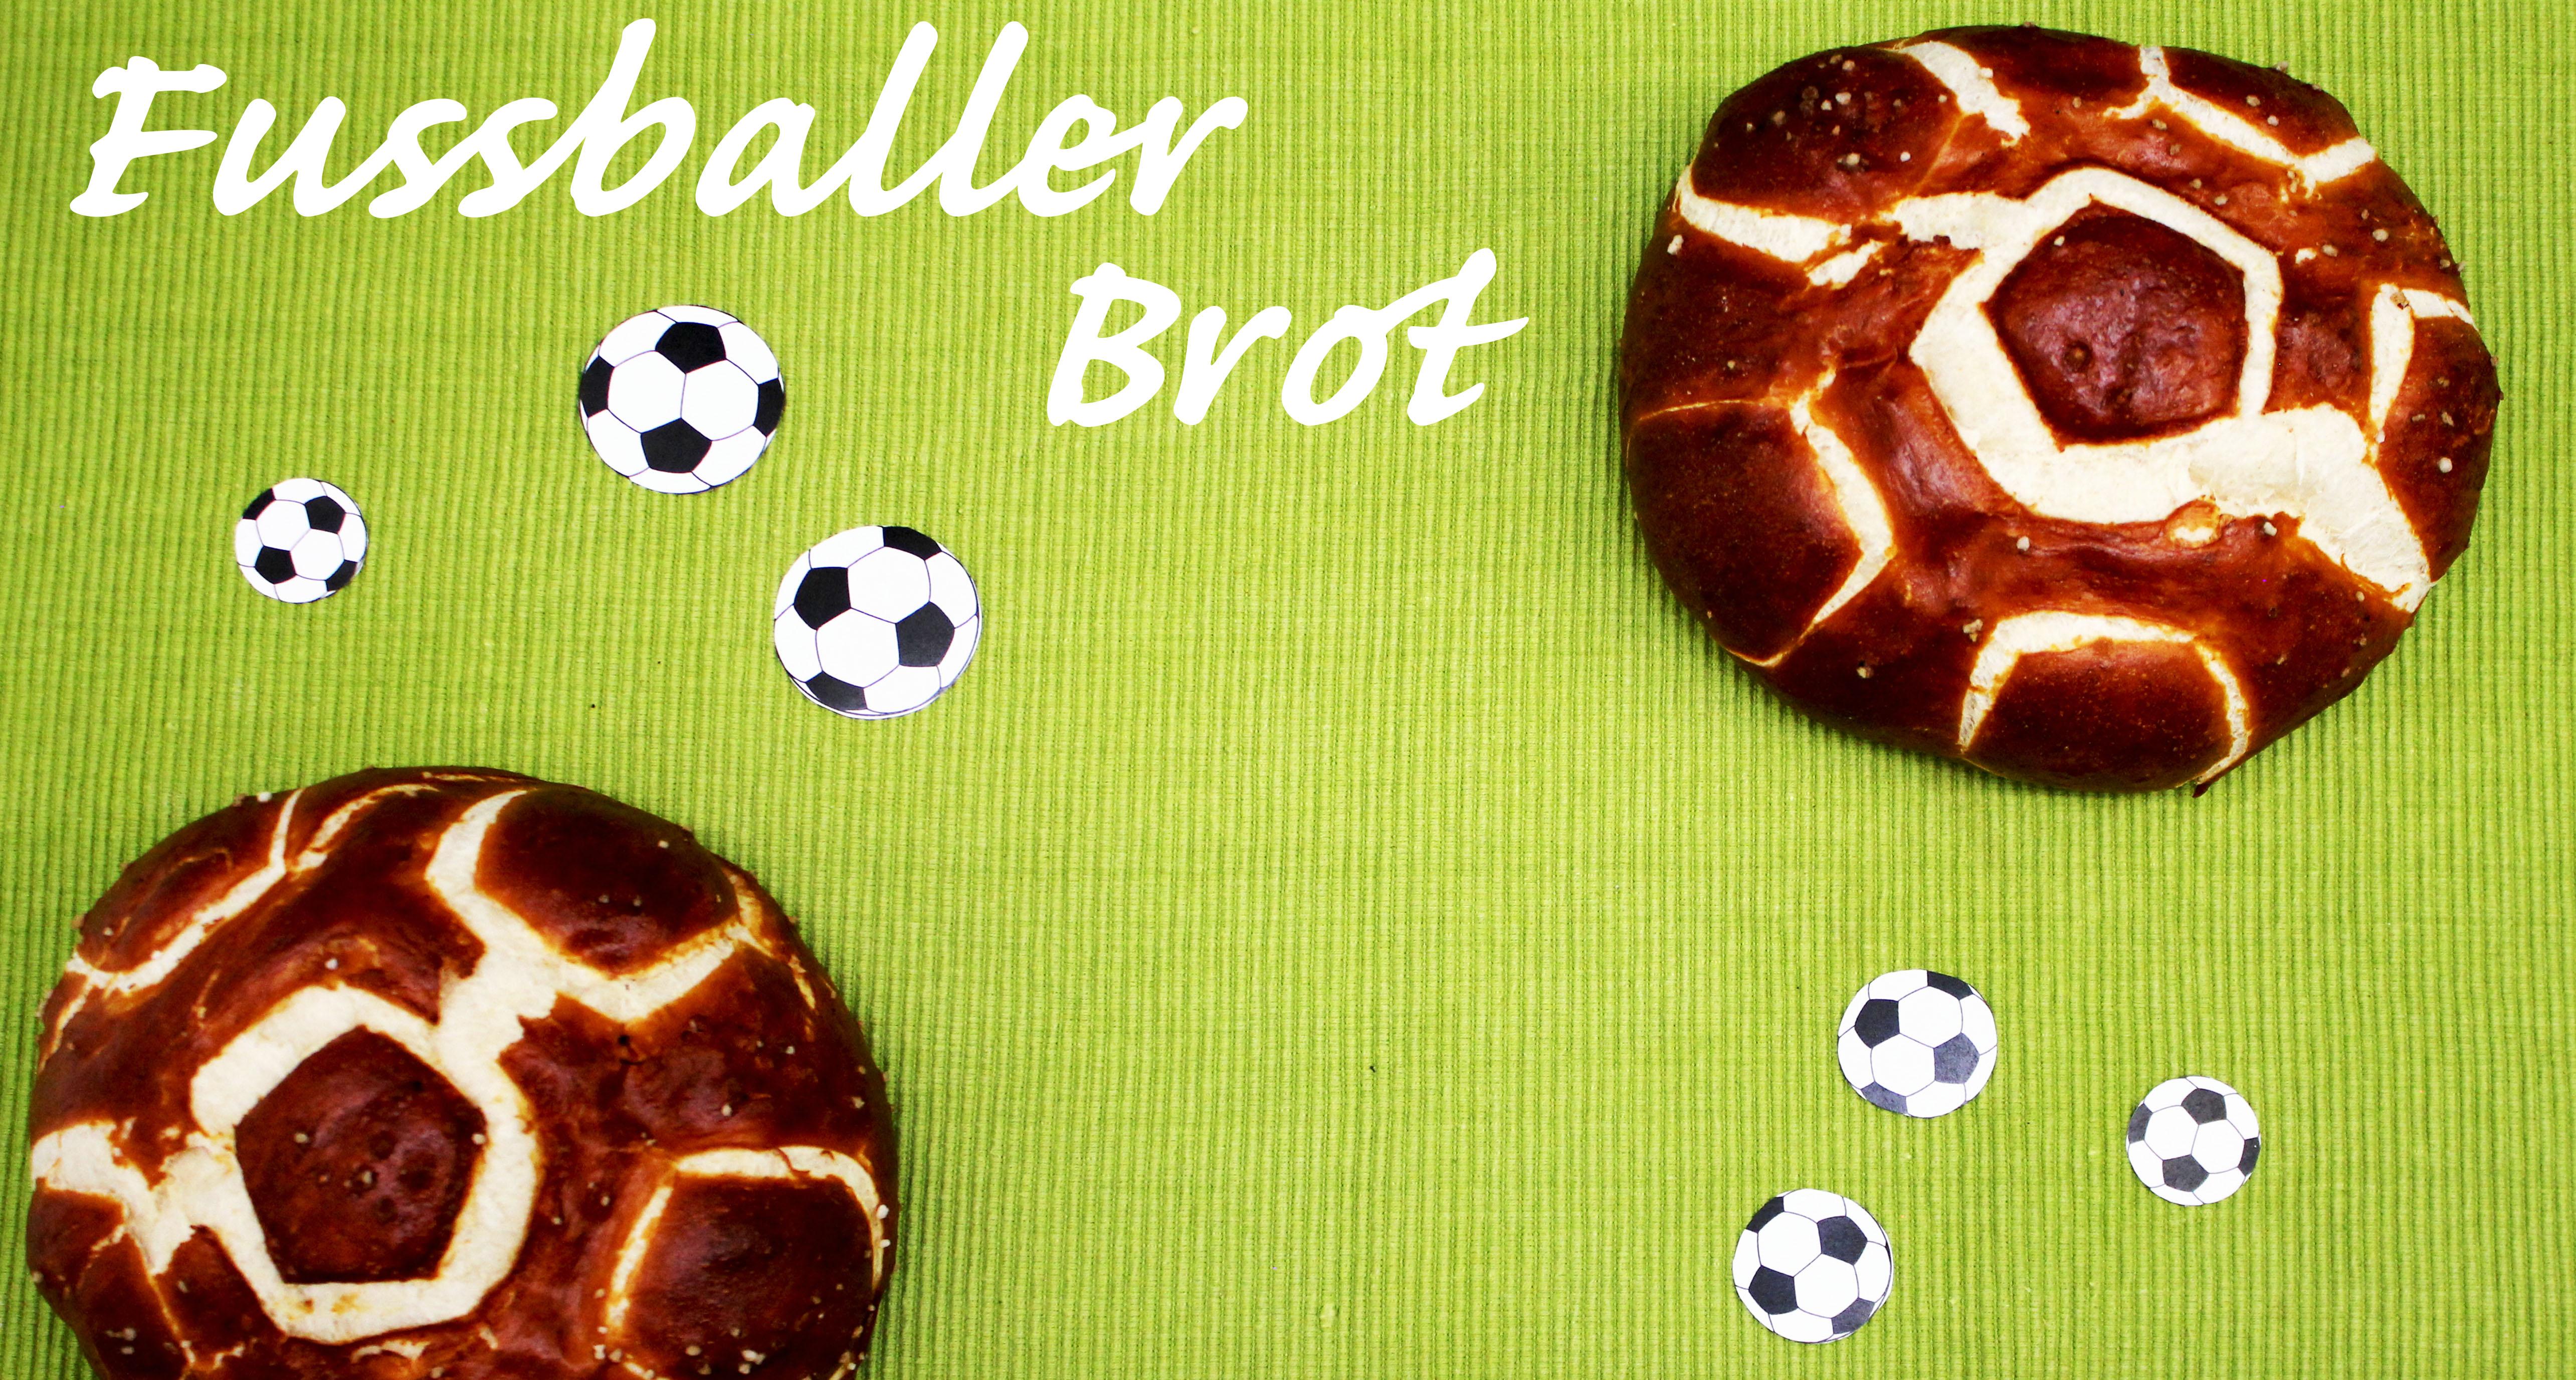 Baeckerei_Buergin_Fussballbrot_WM_Brot